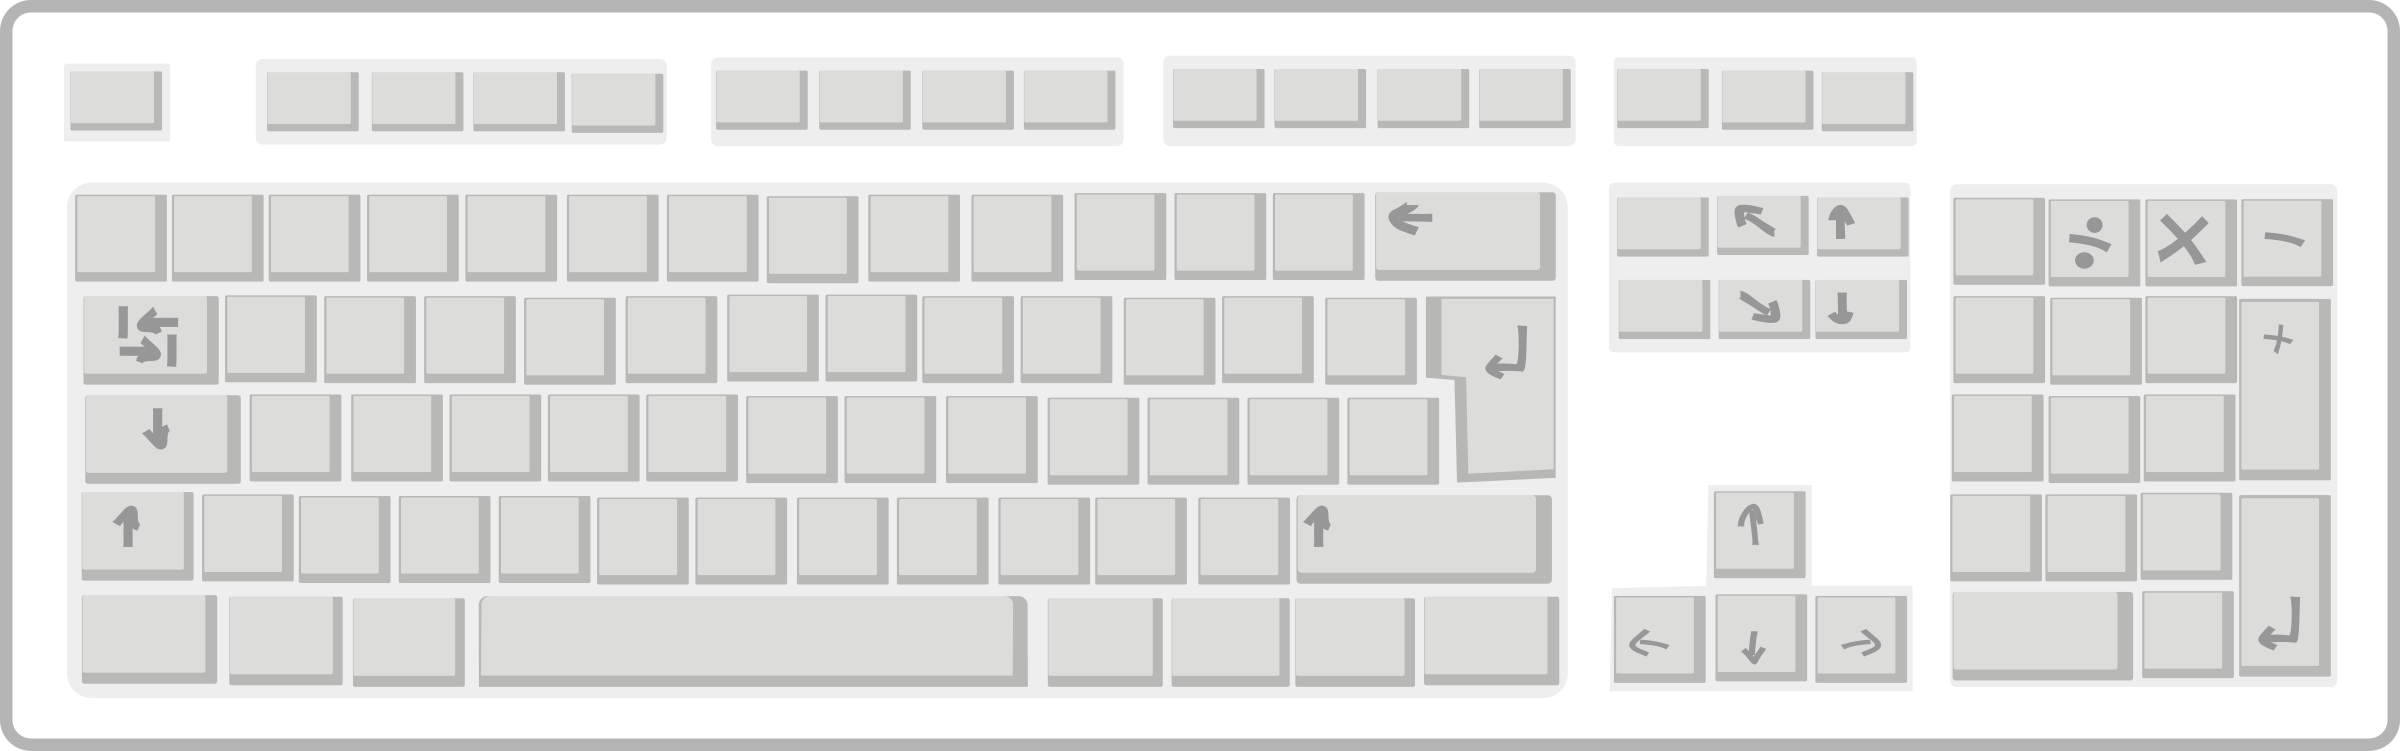 Blank computer keyboard clipart jpg free library Clipart - Blank White Keyboard jpg free library